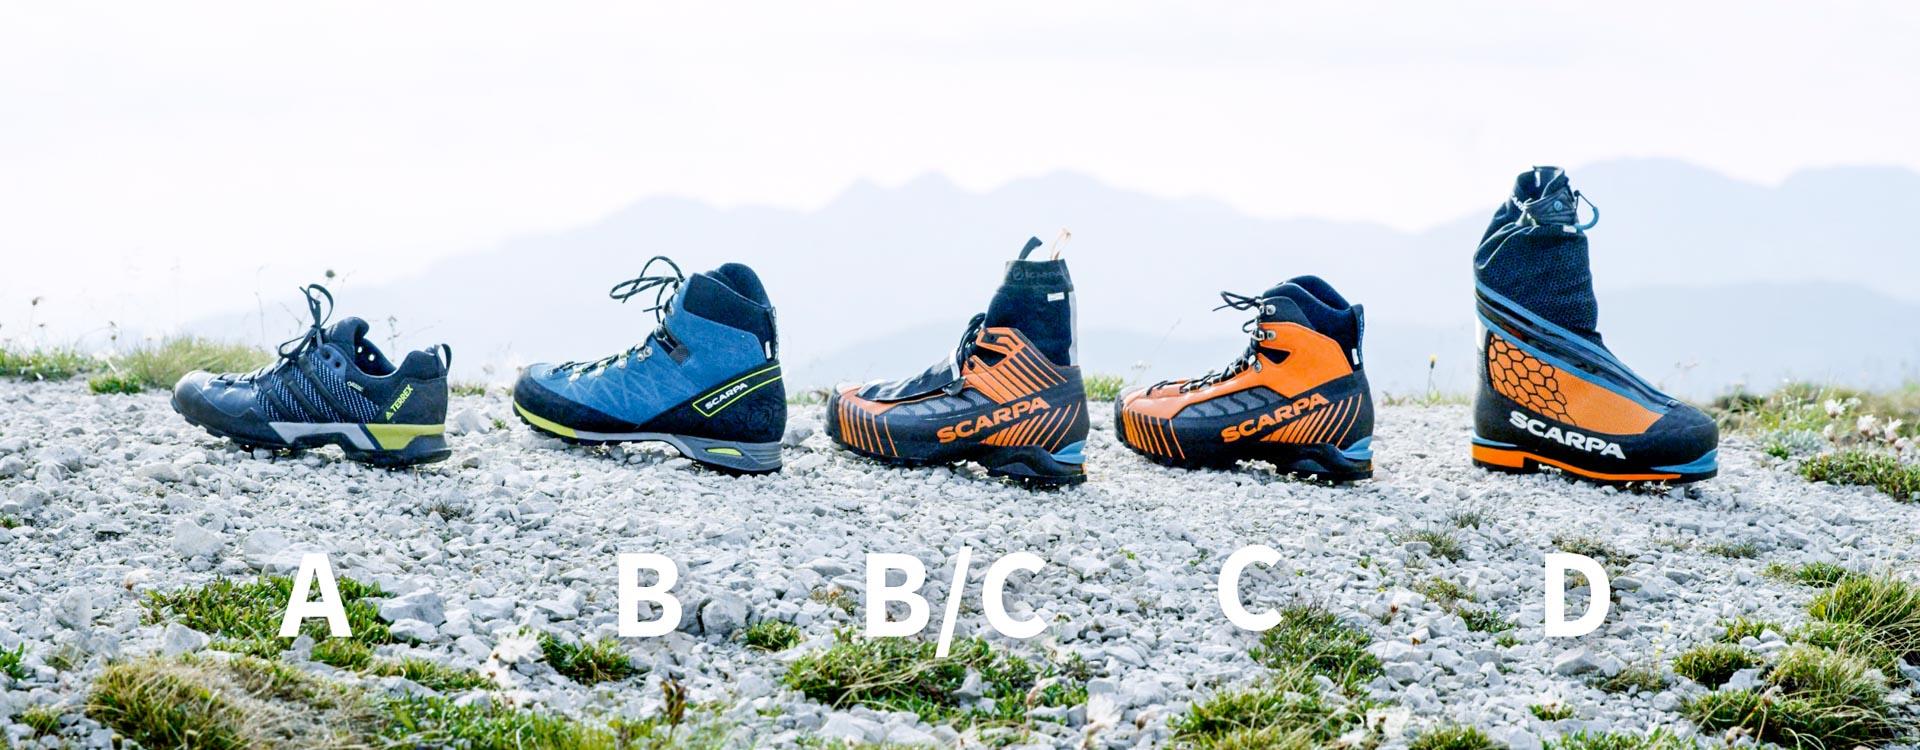 verschiedene-schuh-kategorien-fuer-bergwandern.jpg